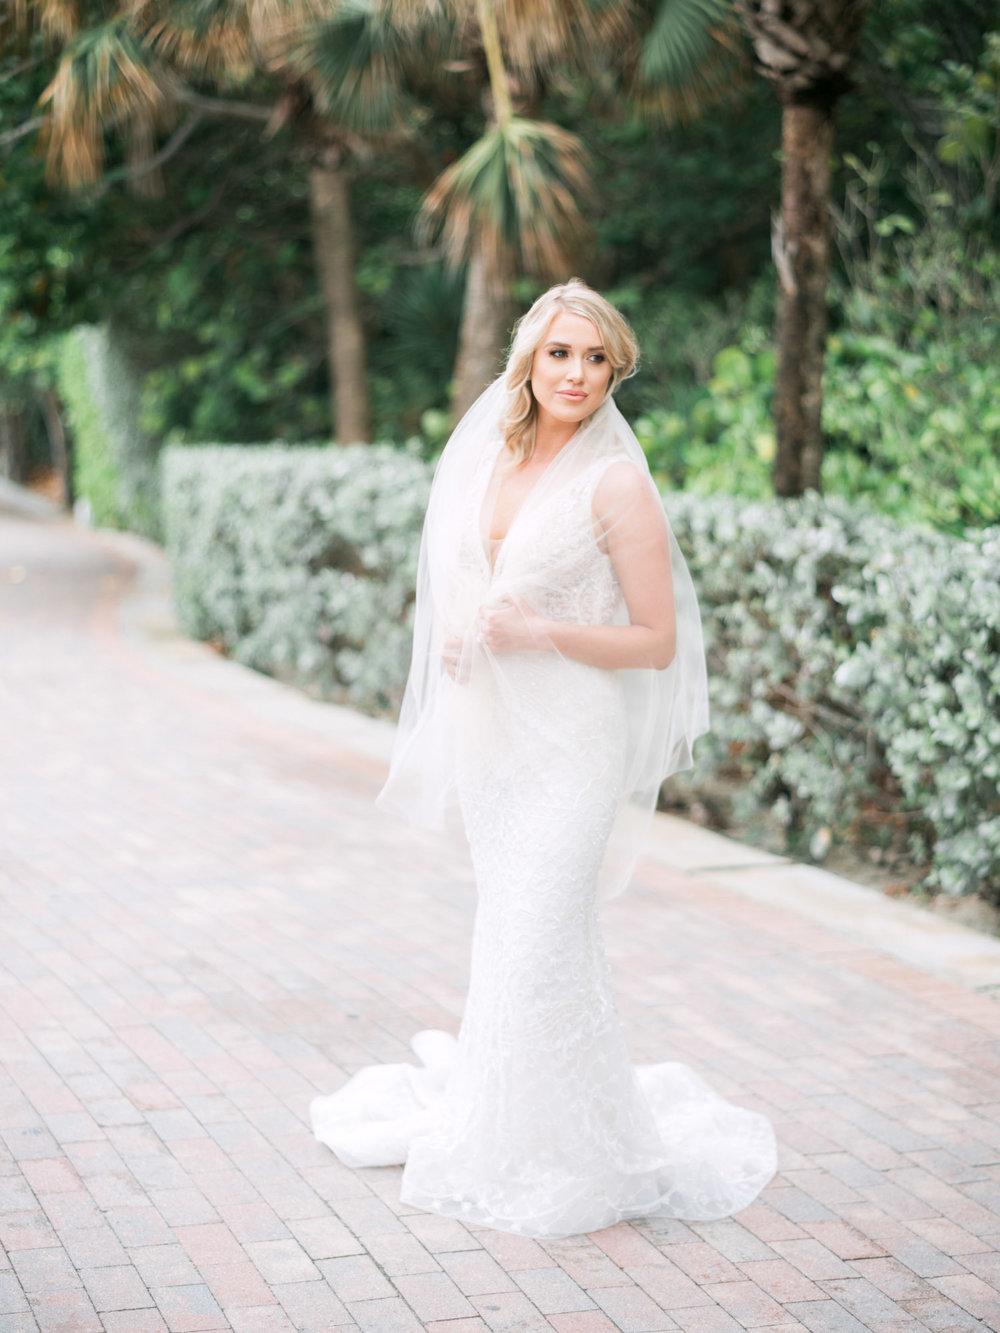 raleigh-miami-beach-destination-film-wedding-0821.jpg